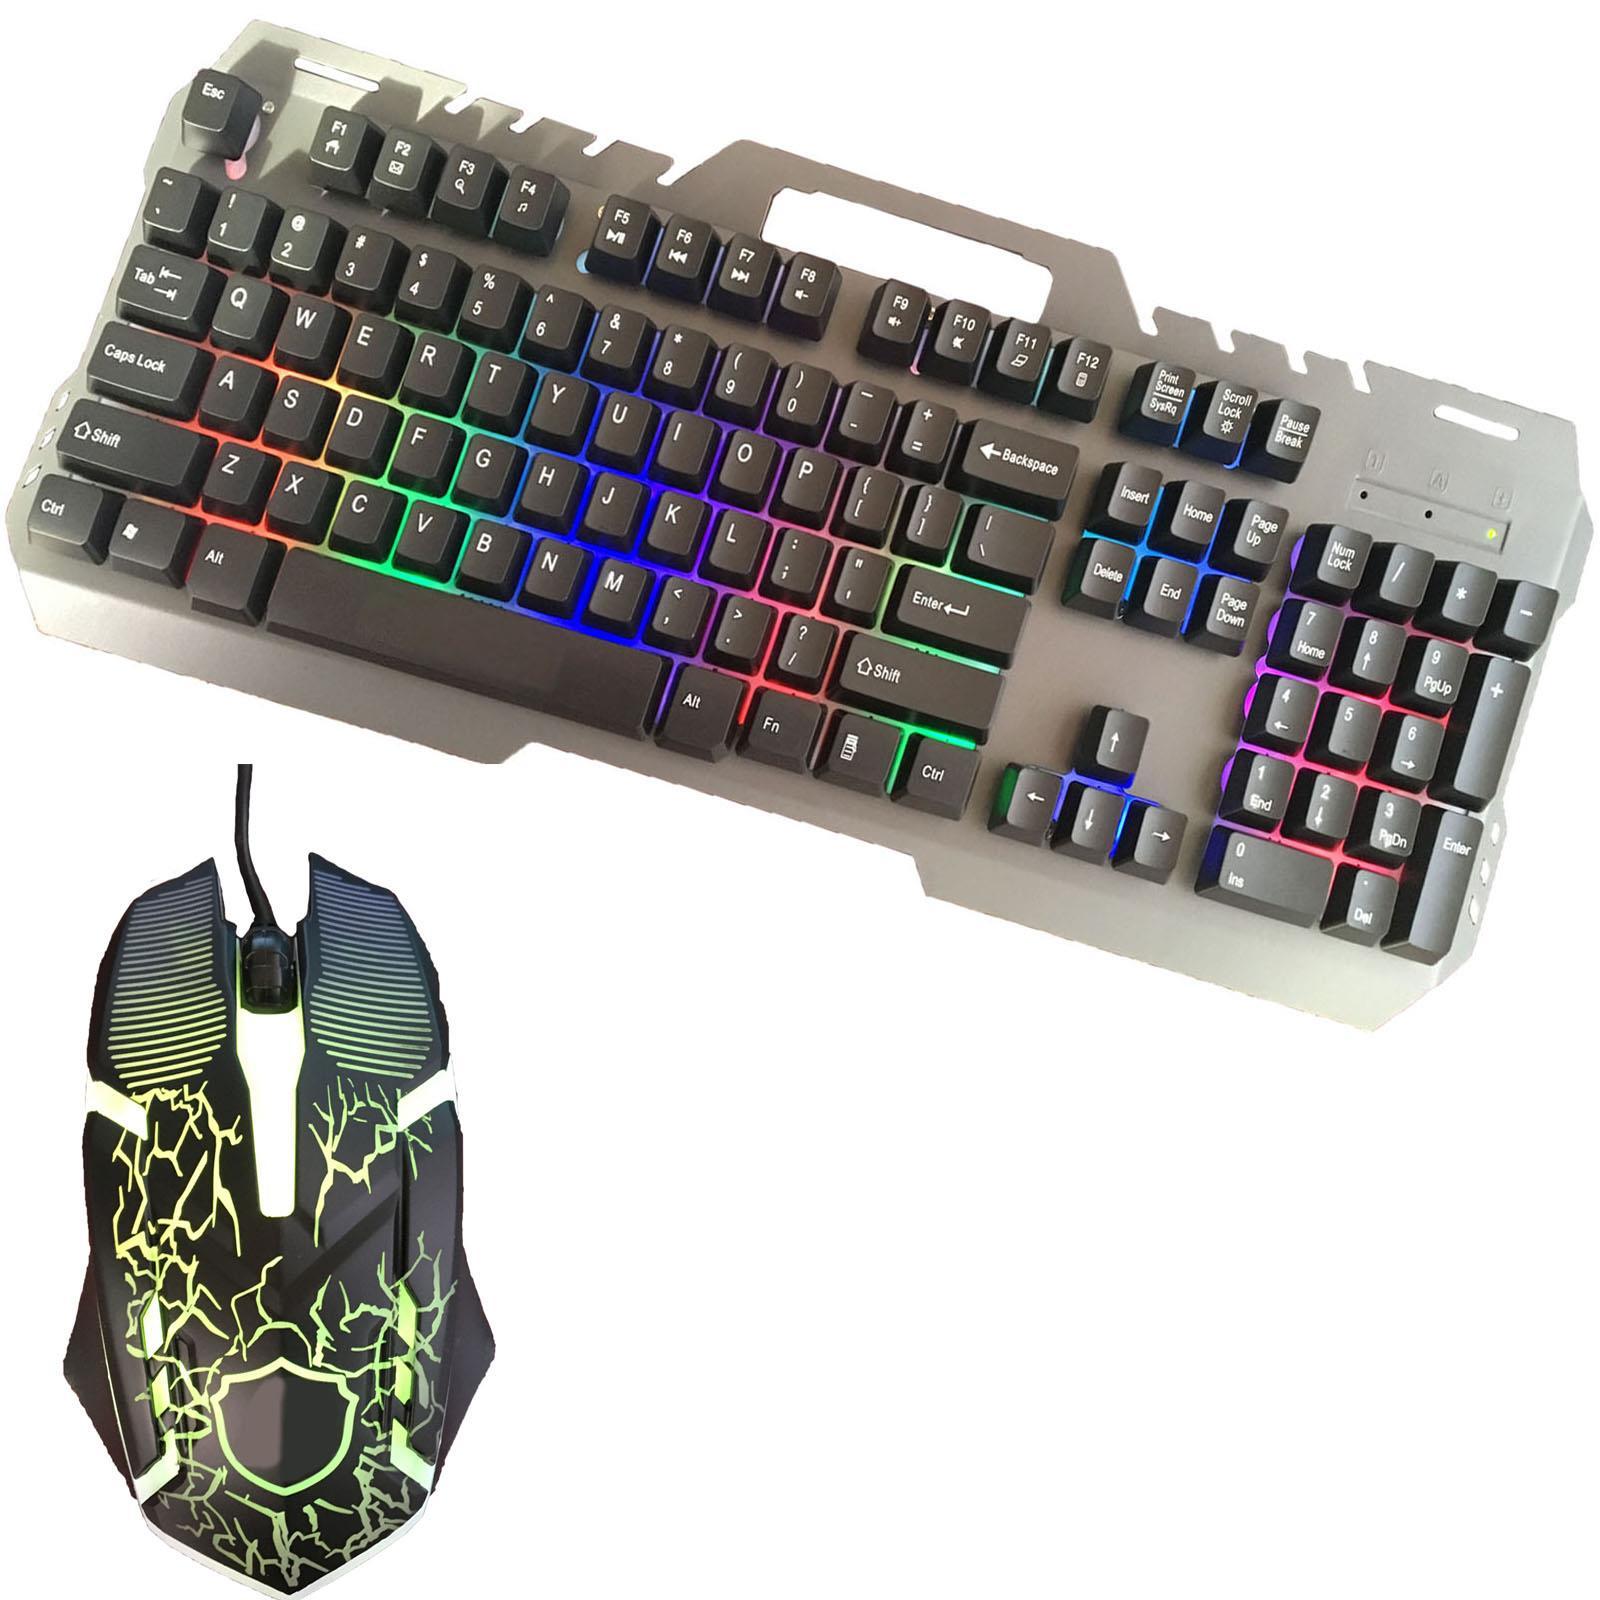 Gaming-Keyboard-Mouse-Backlit-Rainbow-LED-USB-Set-for-PC-Laptop-PS4-Xbox-One thumbnail 39